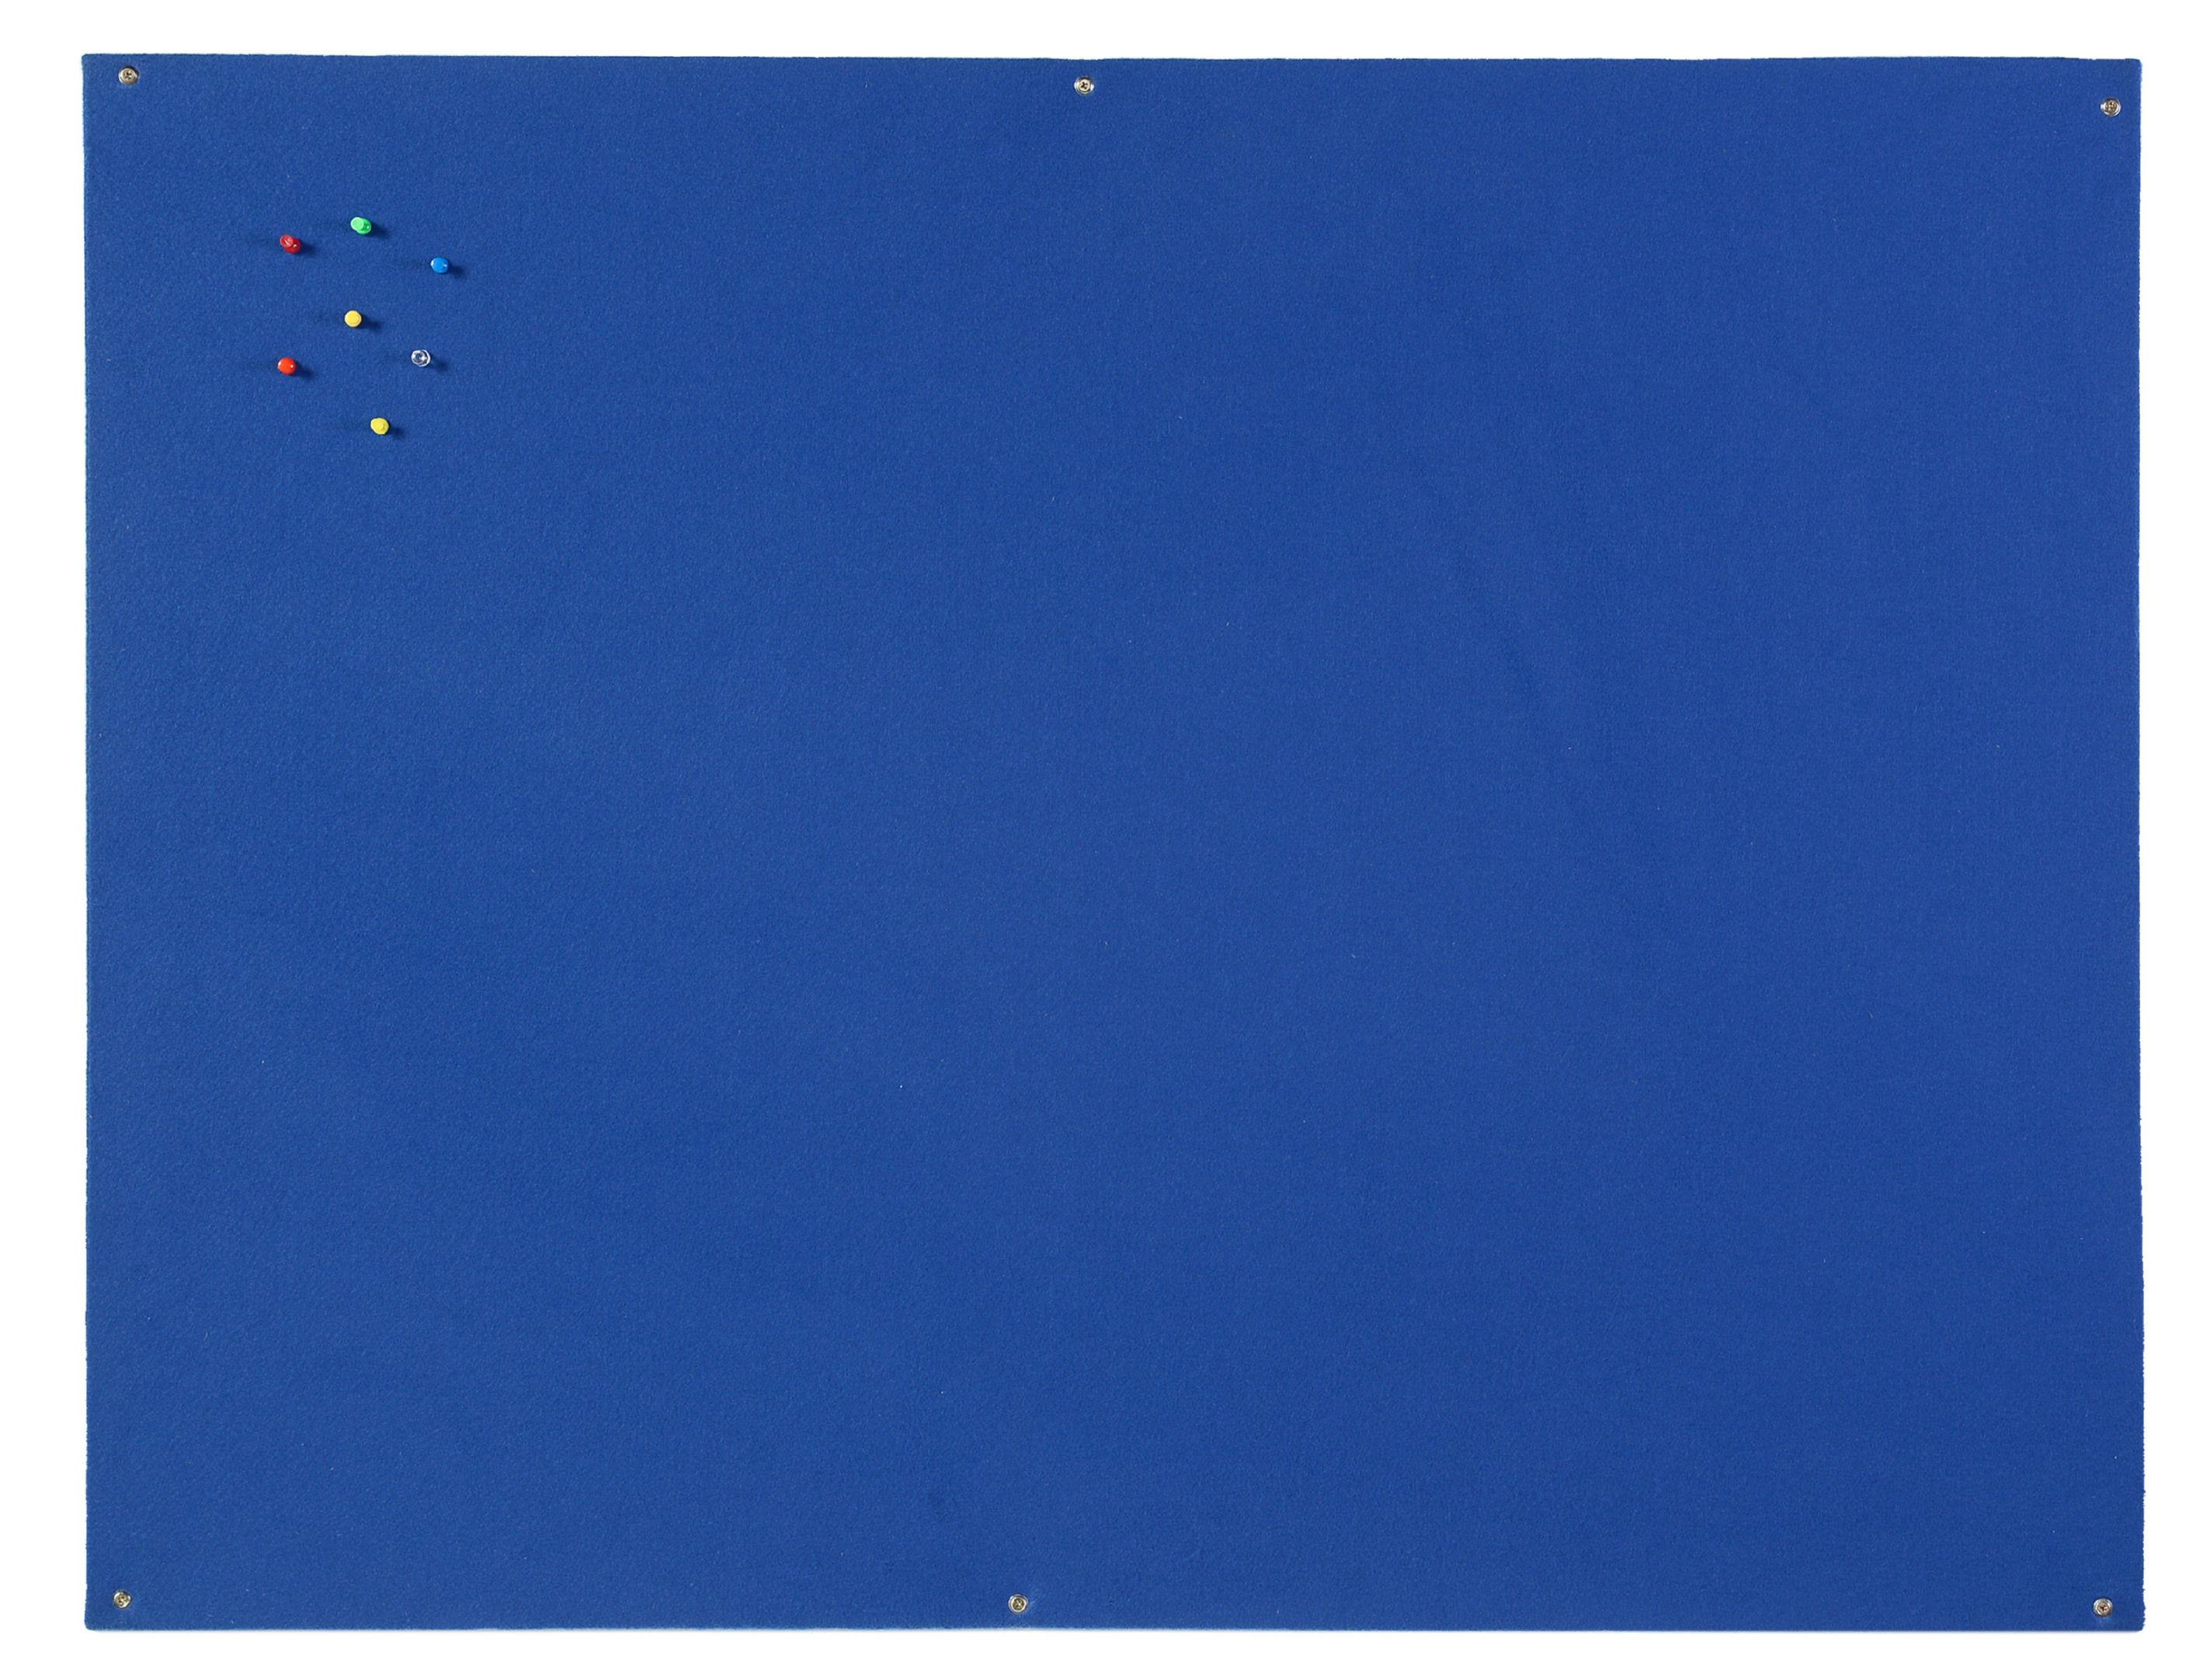 Felt Bi-Office Blue Felt Noticeboard Unframed 900x600mm